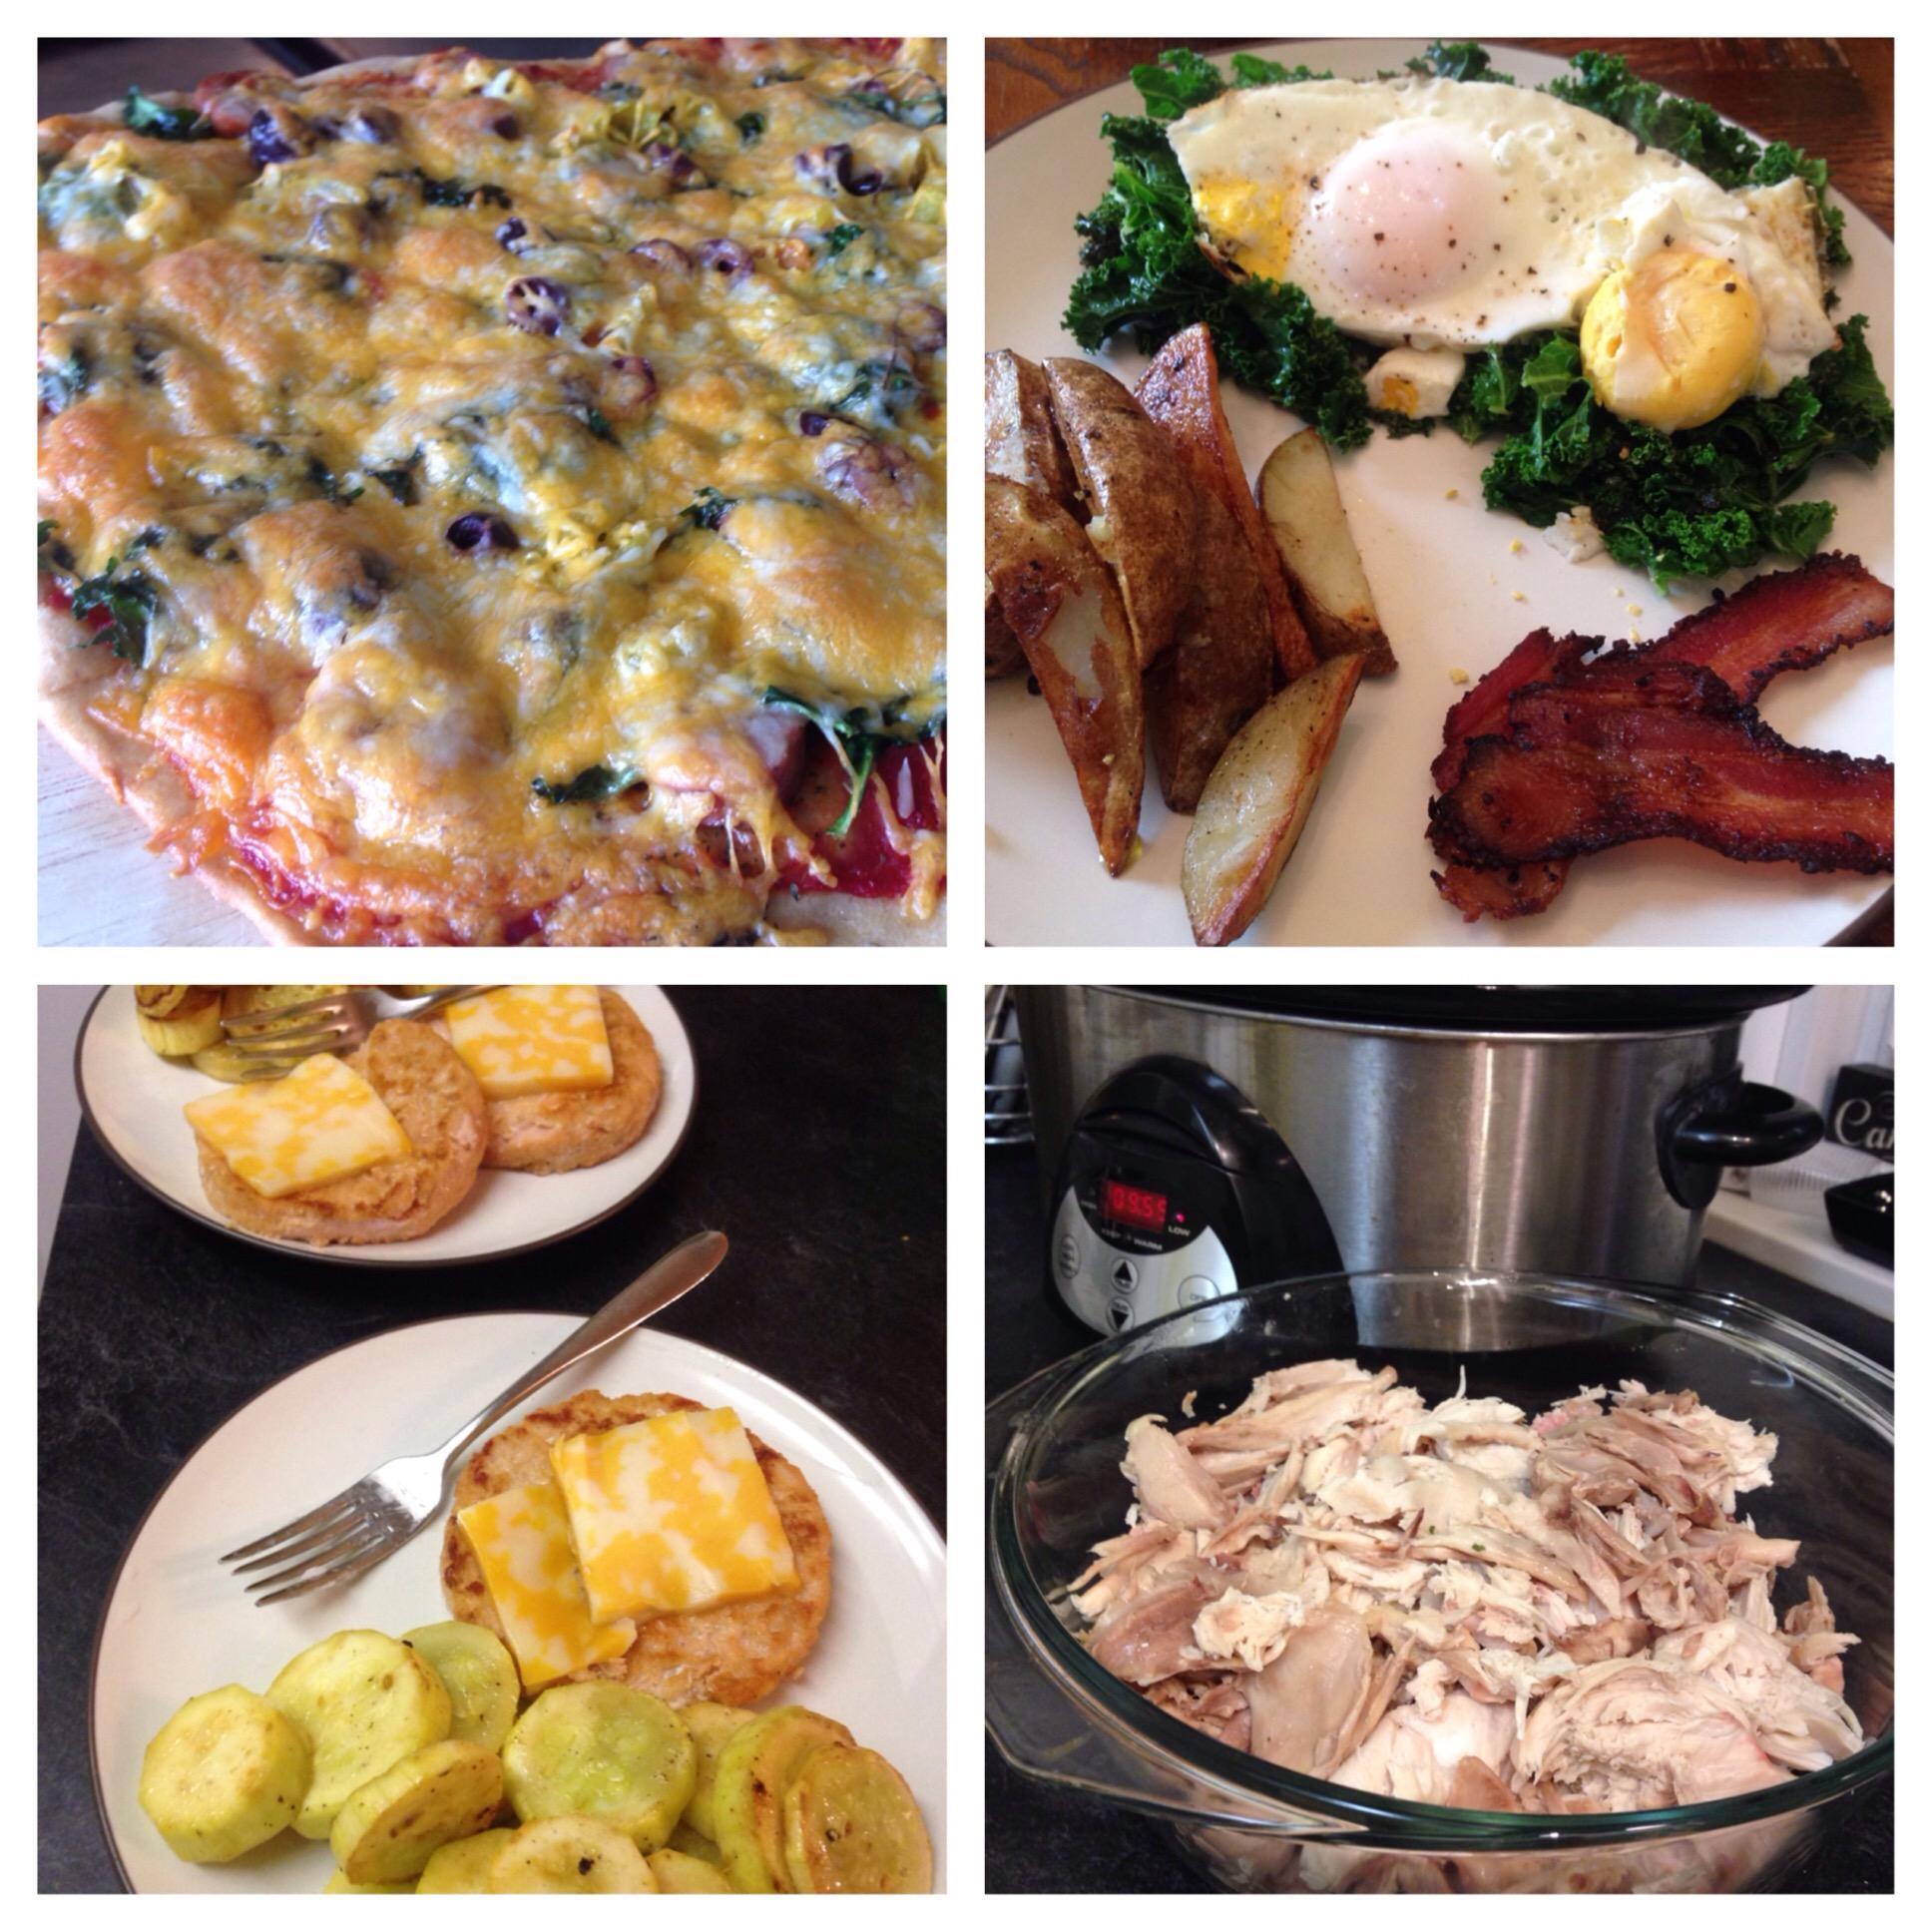 homemade pizza, breakfast, salmon burgers, rotisserie chicken